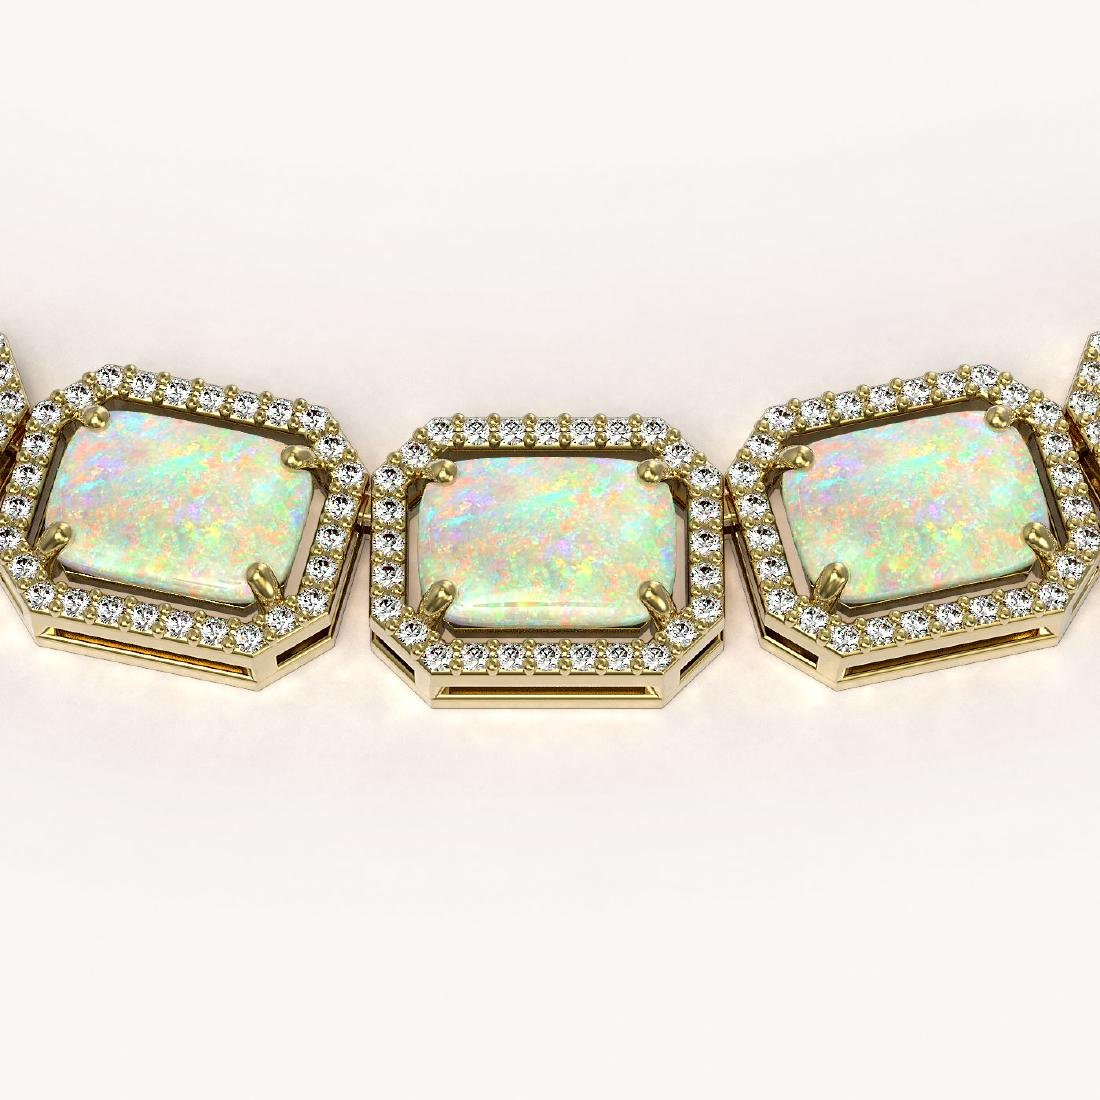 53.59 CTW Opal & Diamond Halo Necklace 10K Yellow Gold - 3